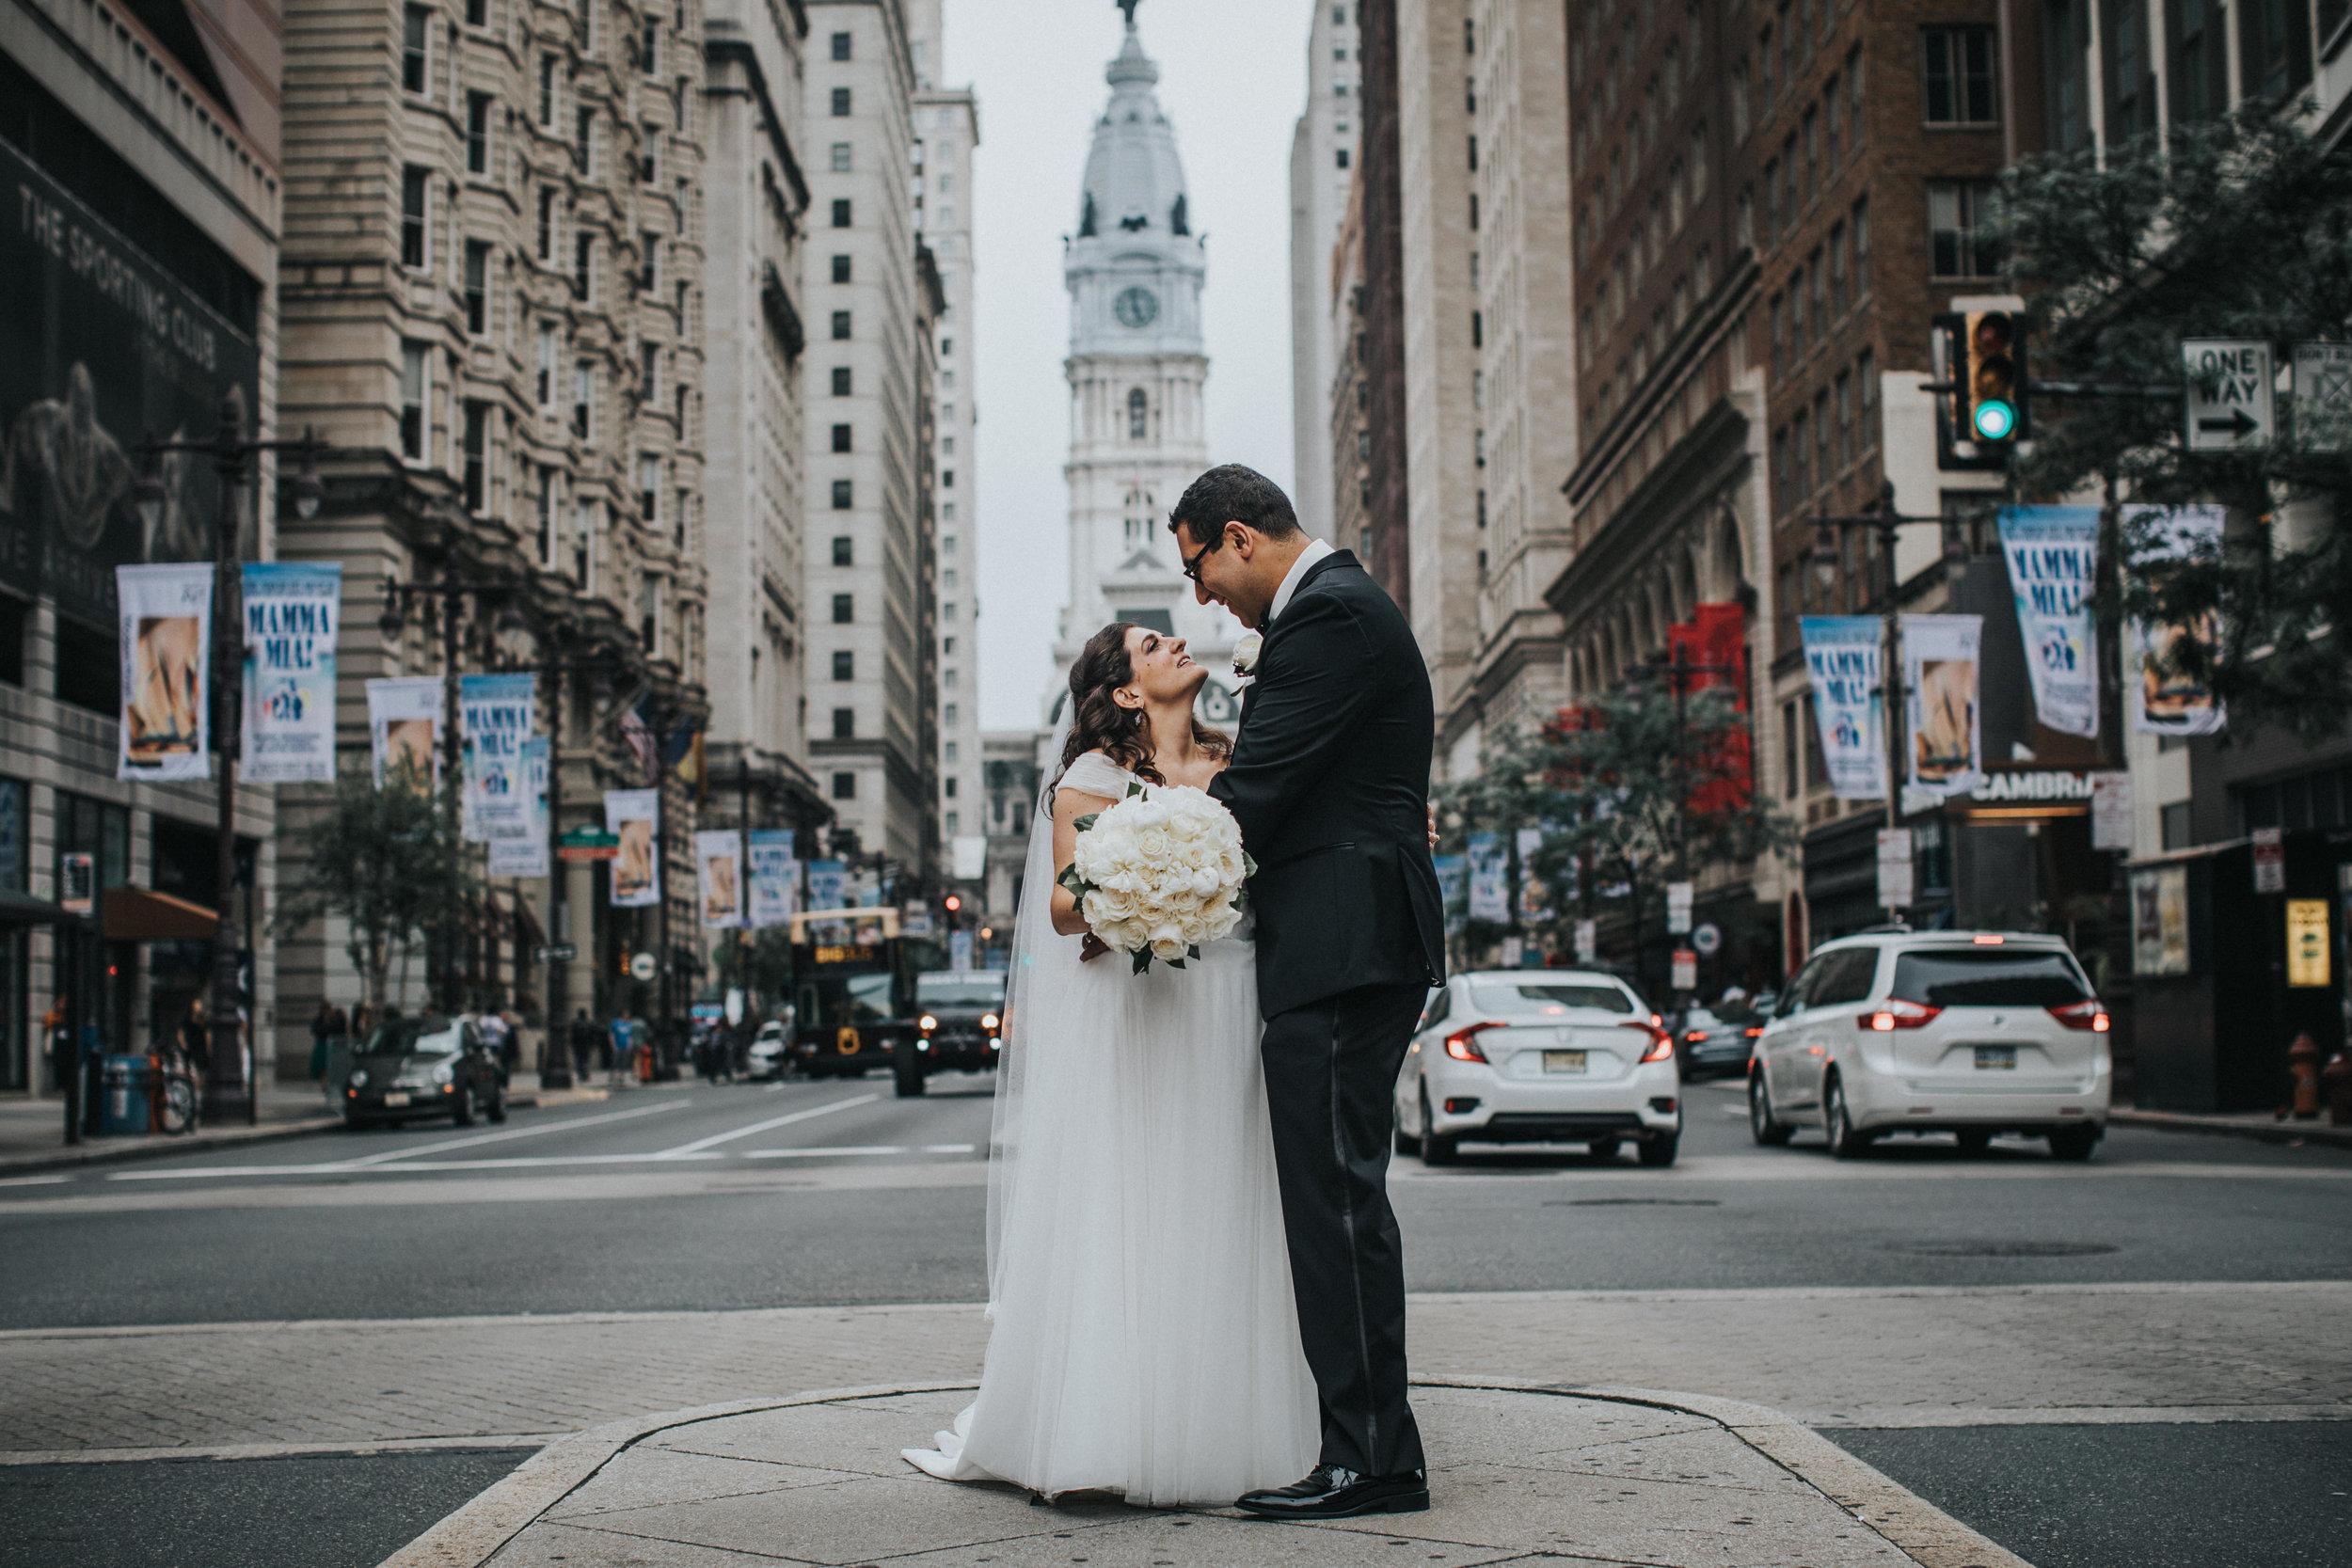 JennaLynnPhotography-NJWeddingPhotographer-Philadelphia-Wedding-ArtsBallroom-BridalParty-63.jpg